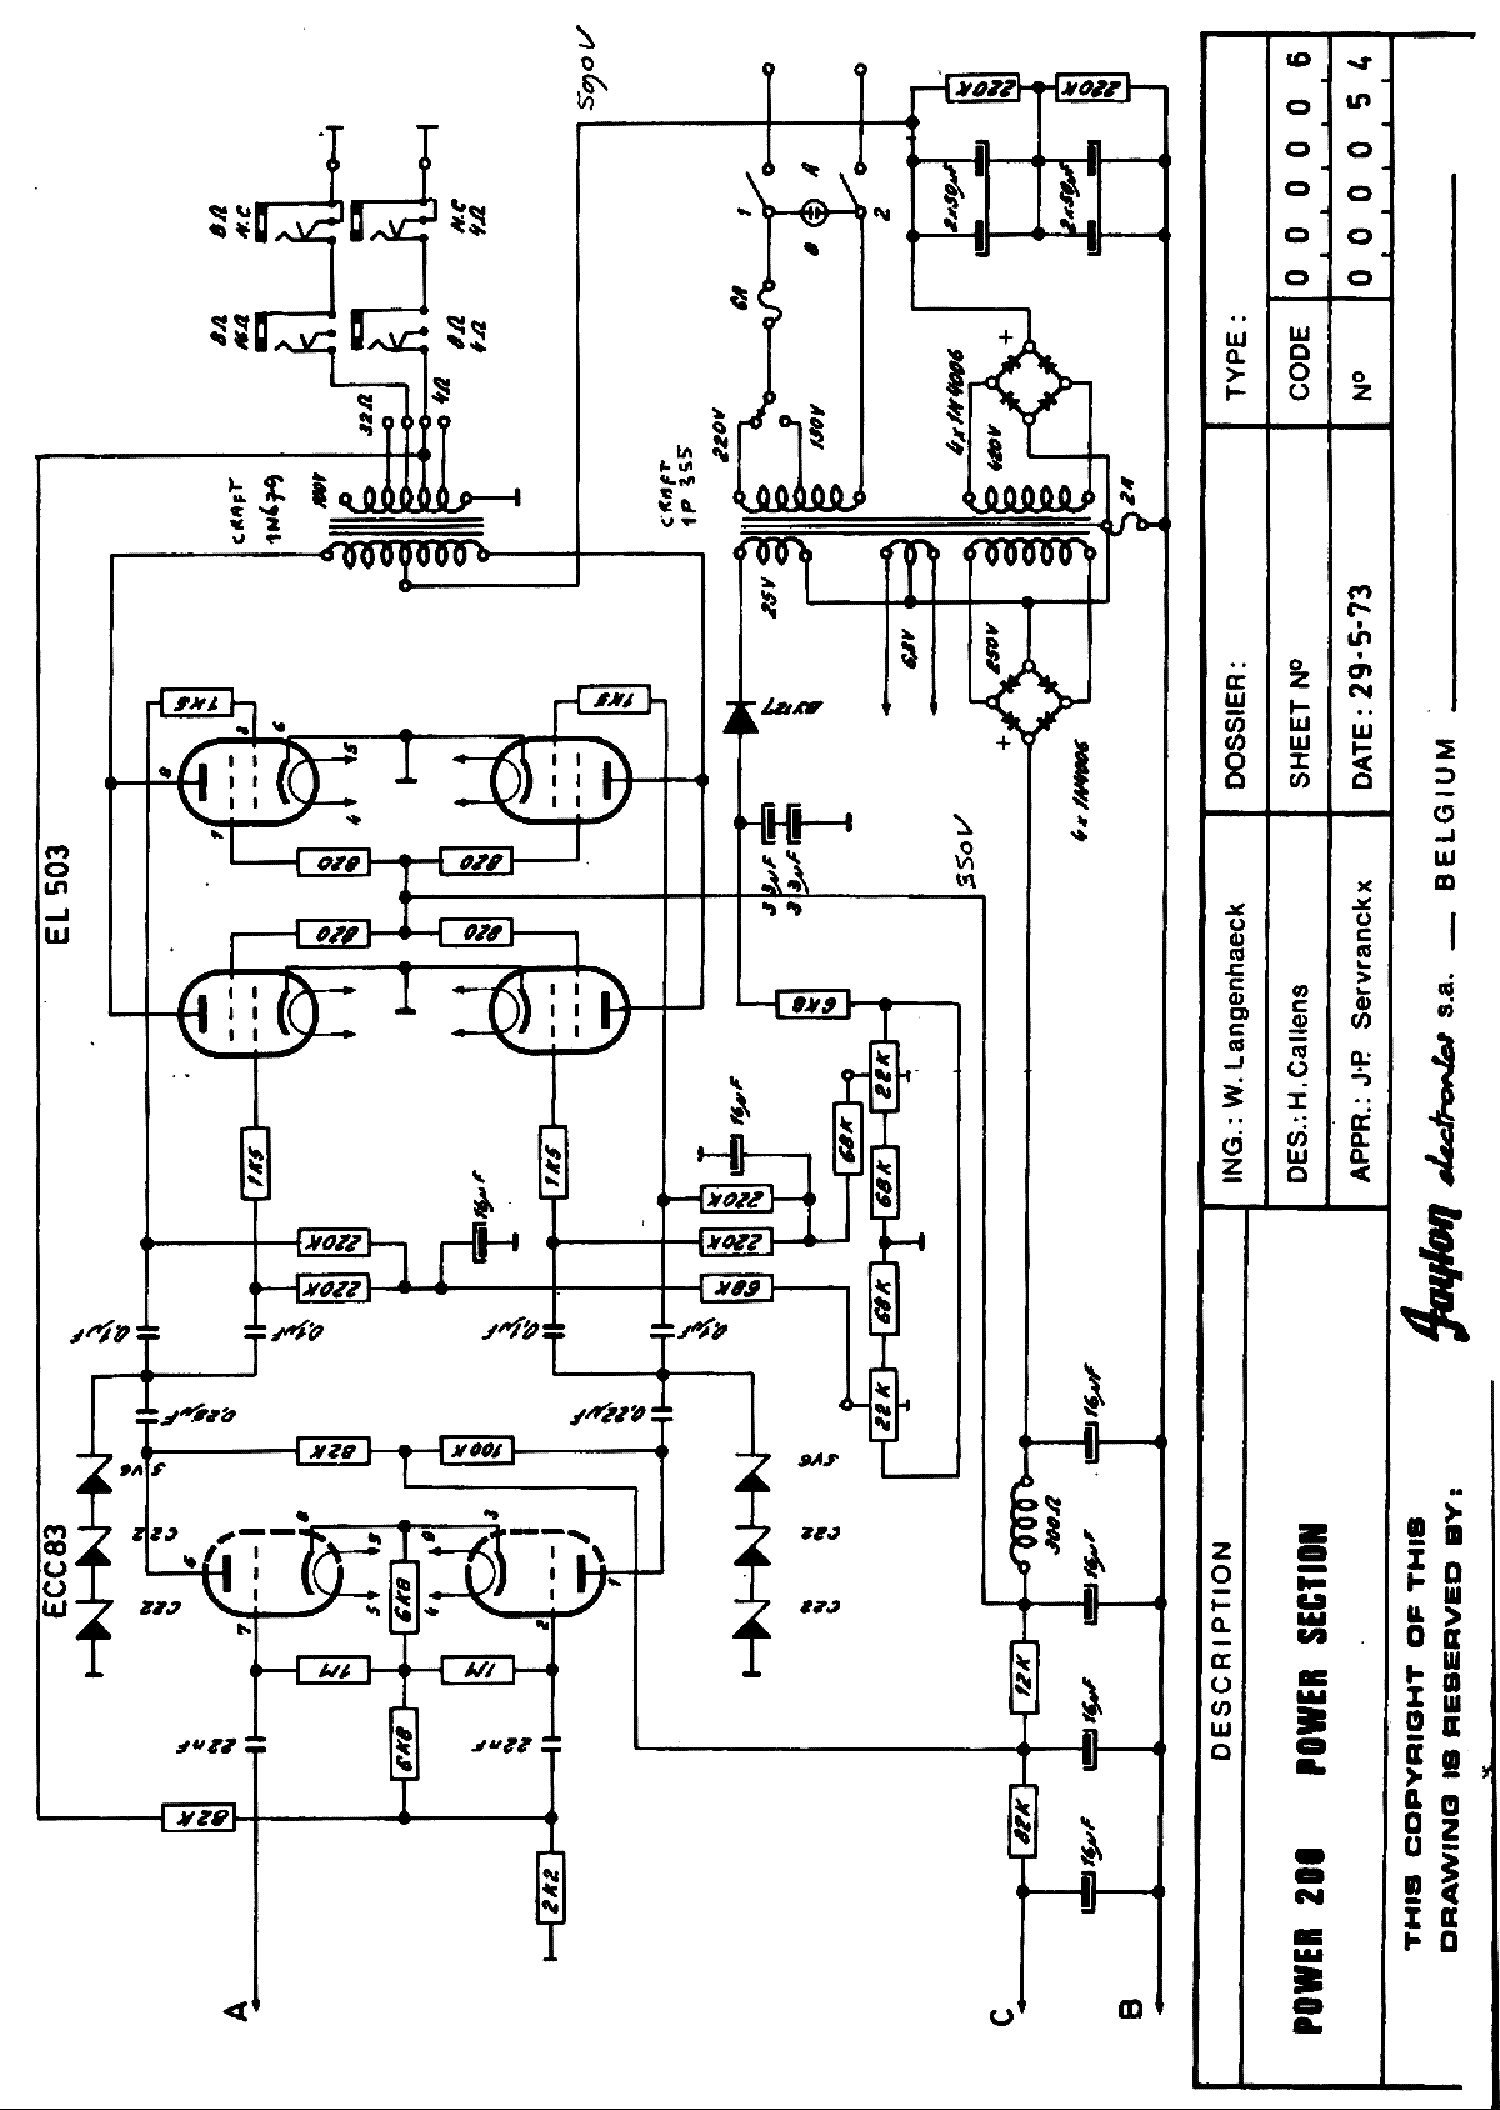 200 watt amplifier schematic 600 watt amplifier